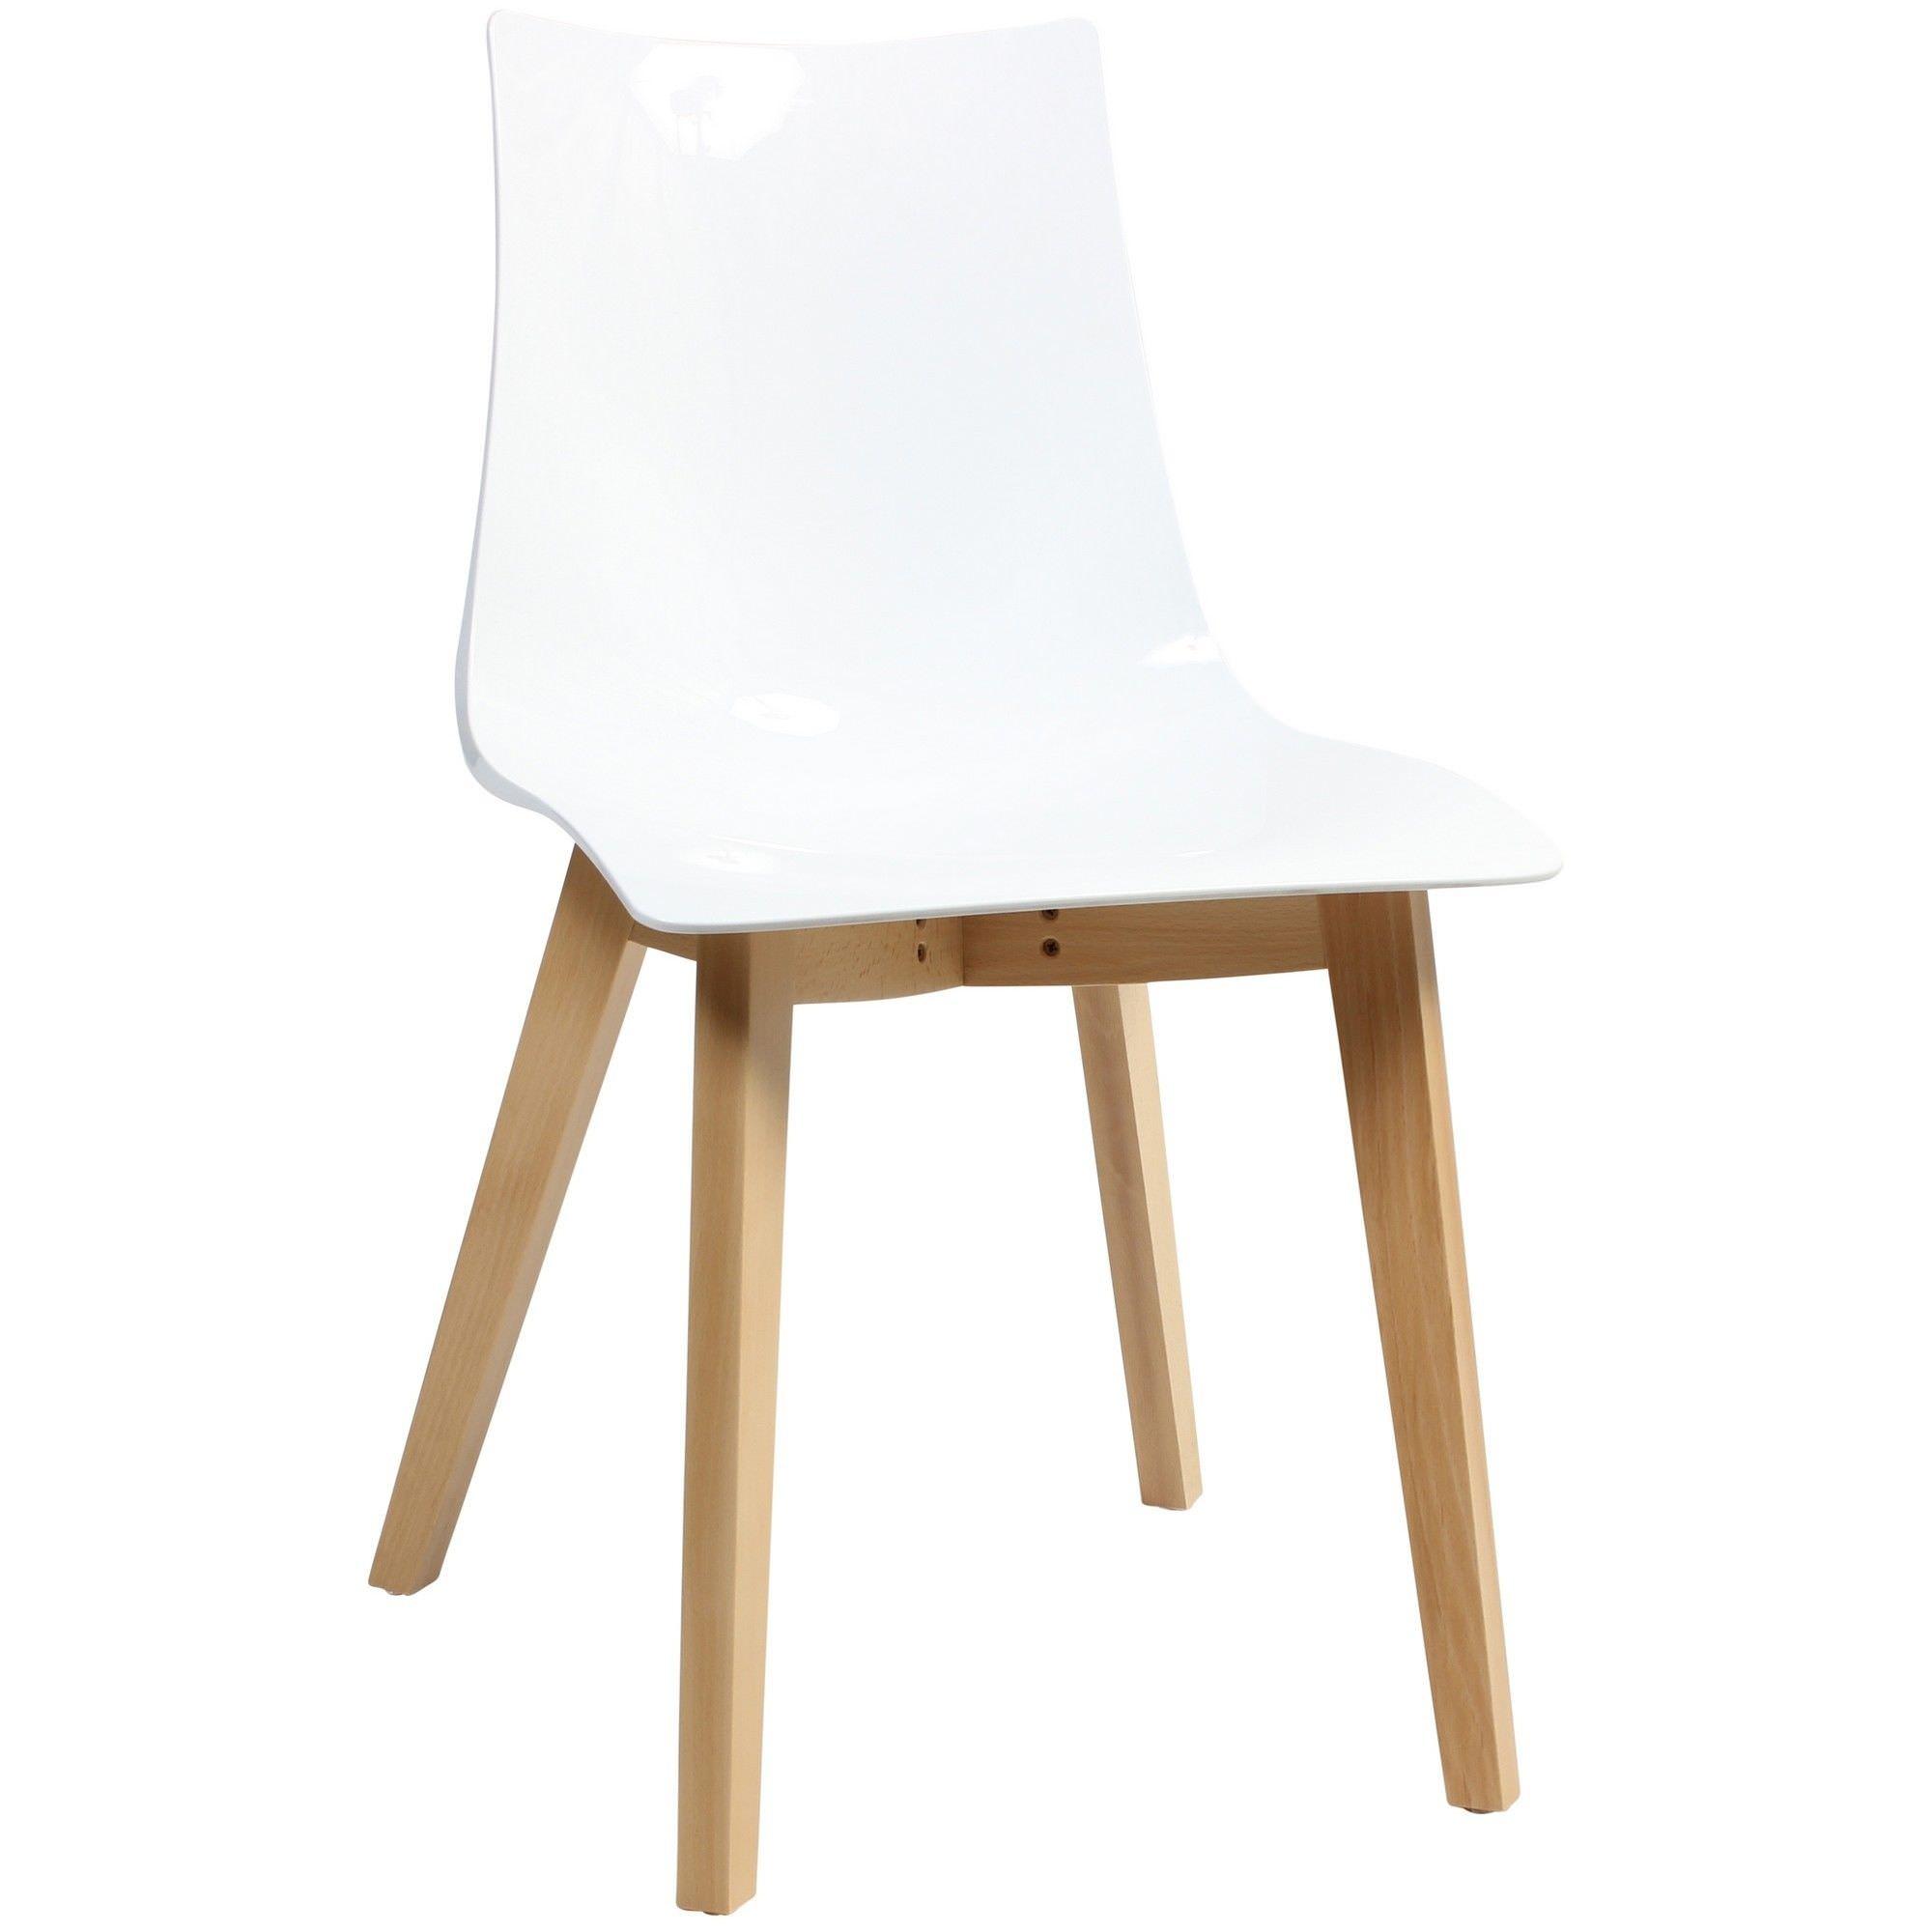 Zebra Italian Made Commercial Grade Dining Chair, Timber Leg, White / Natural